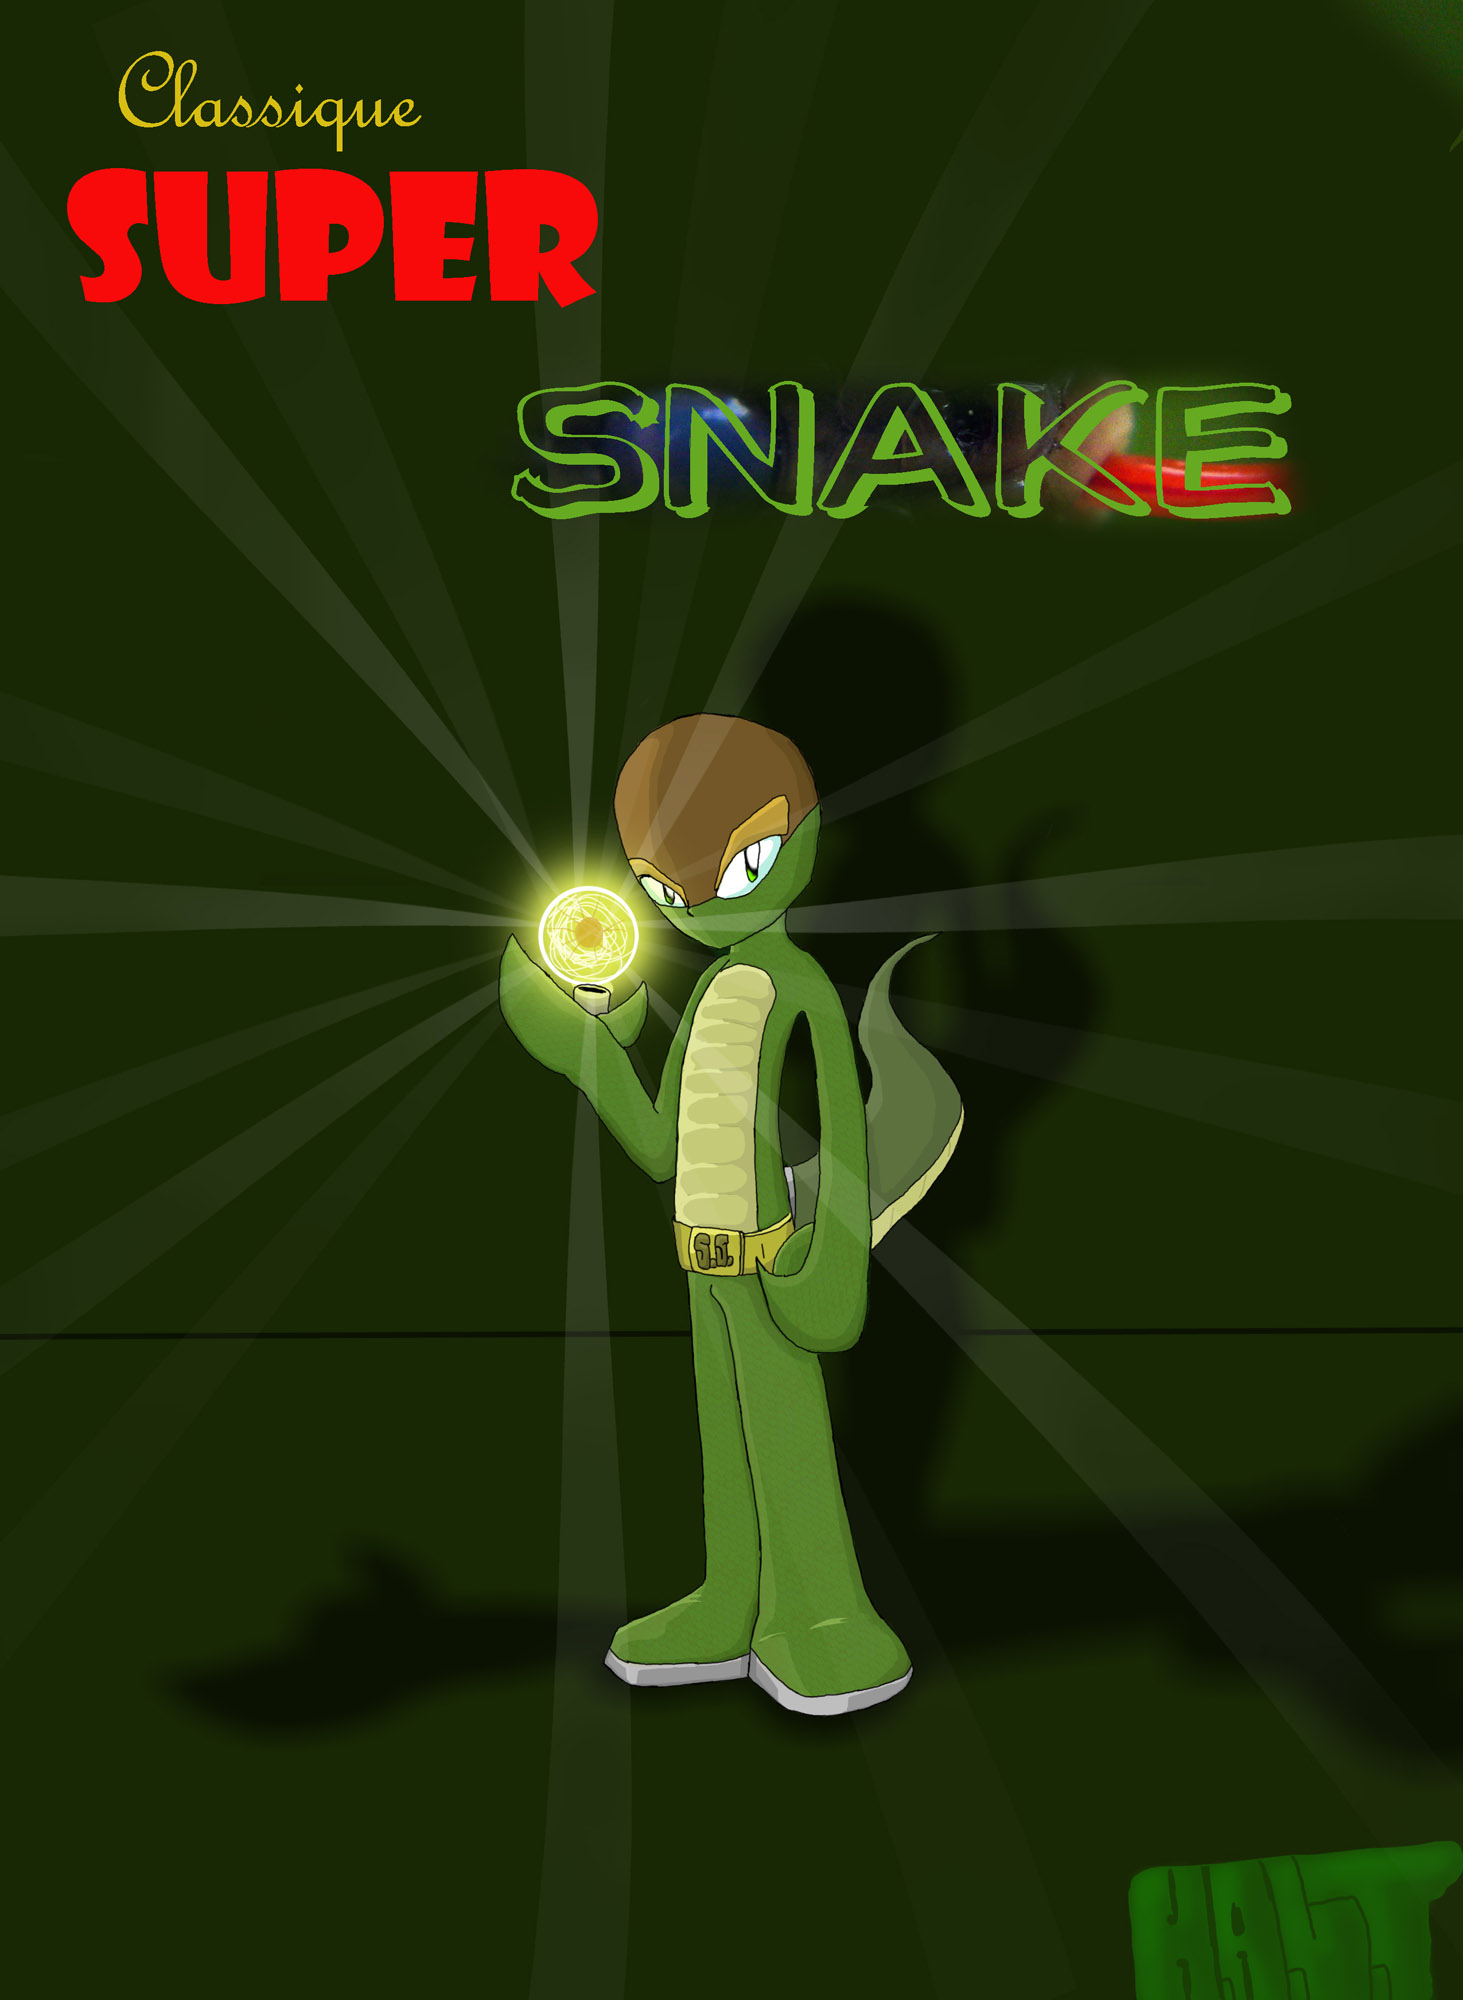 Classique Super Snake